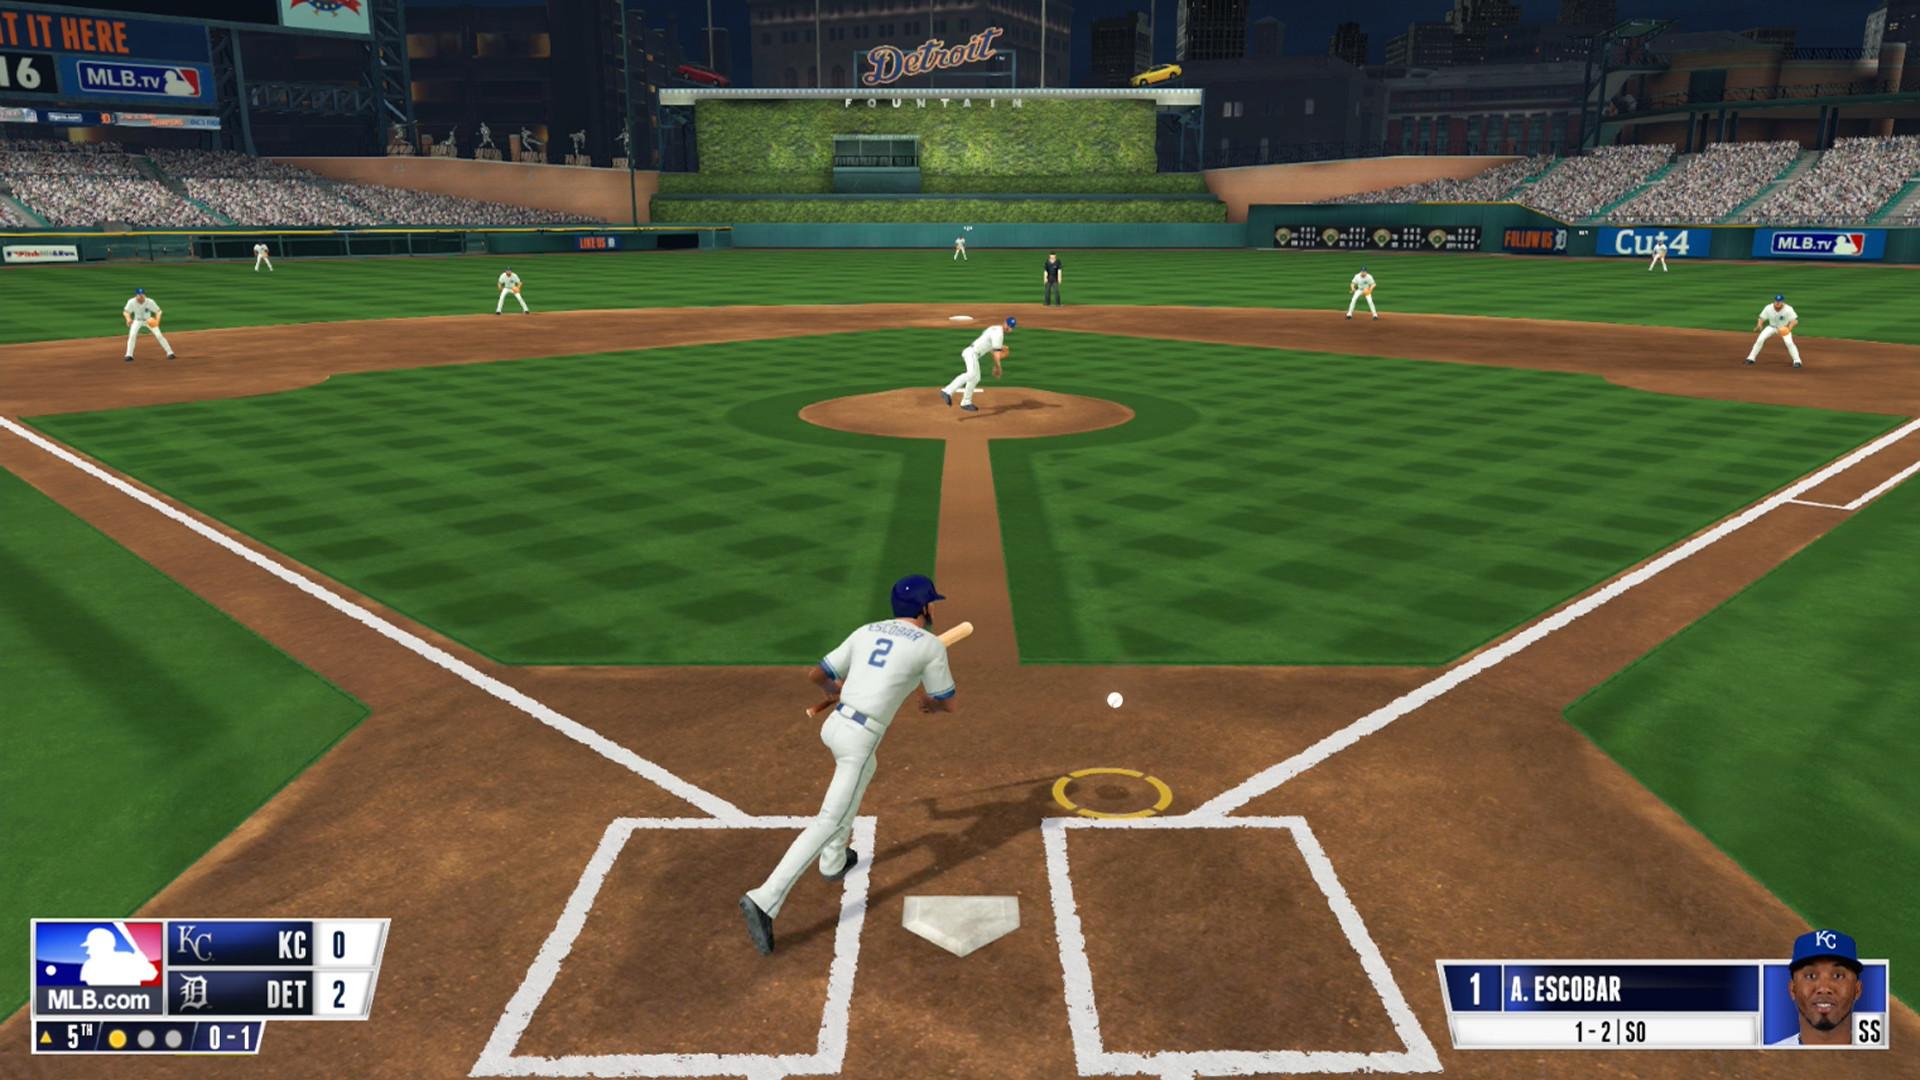 R.B.I. Baseball 16 image 2